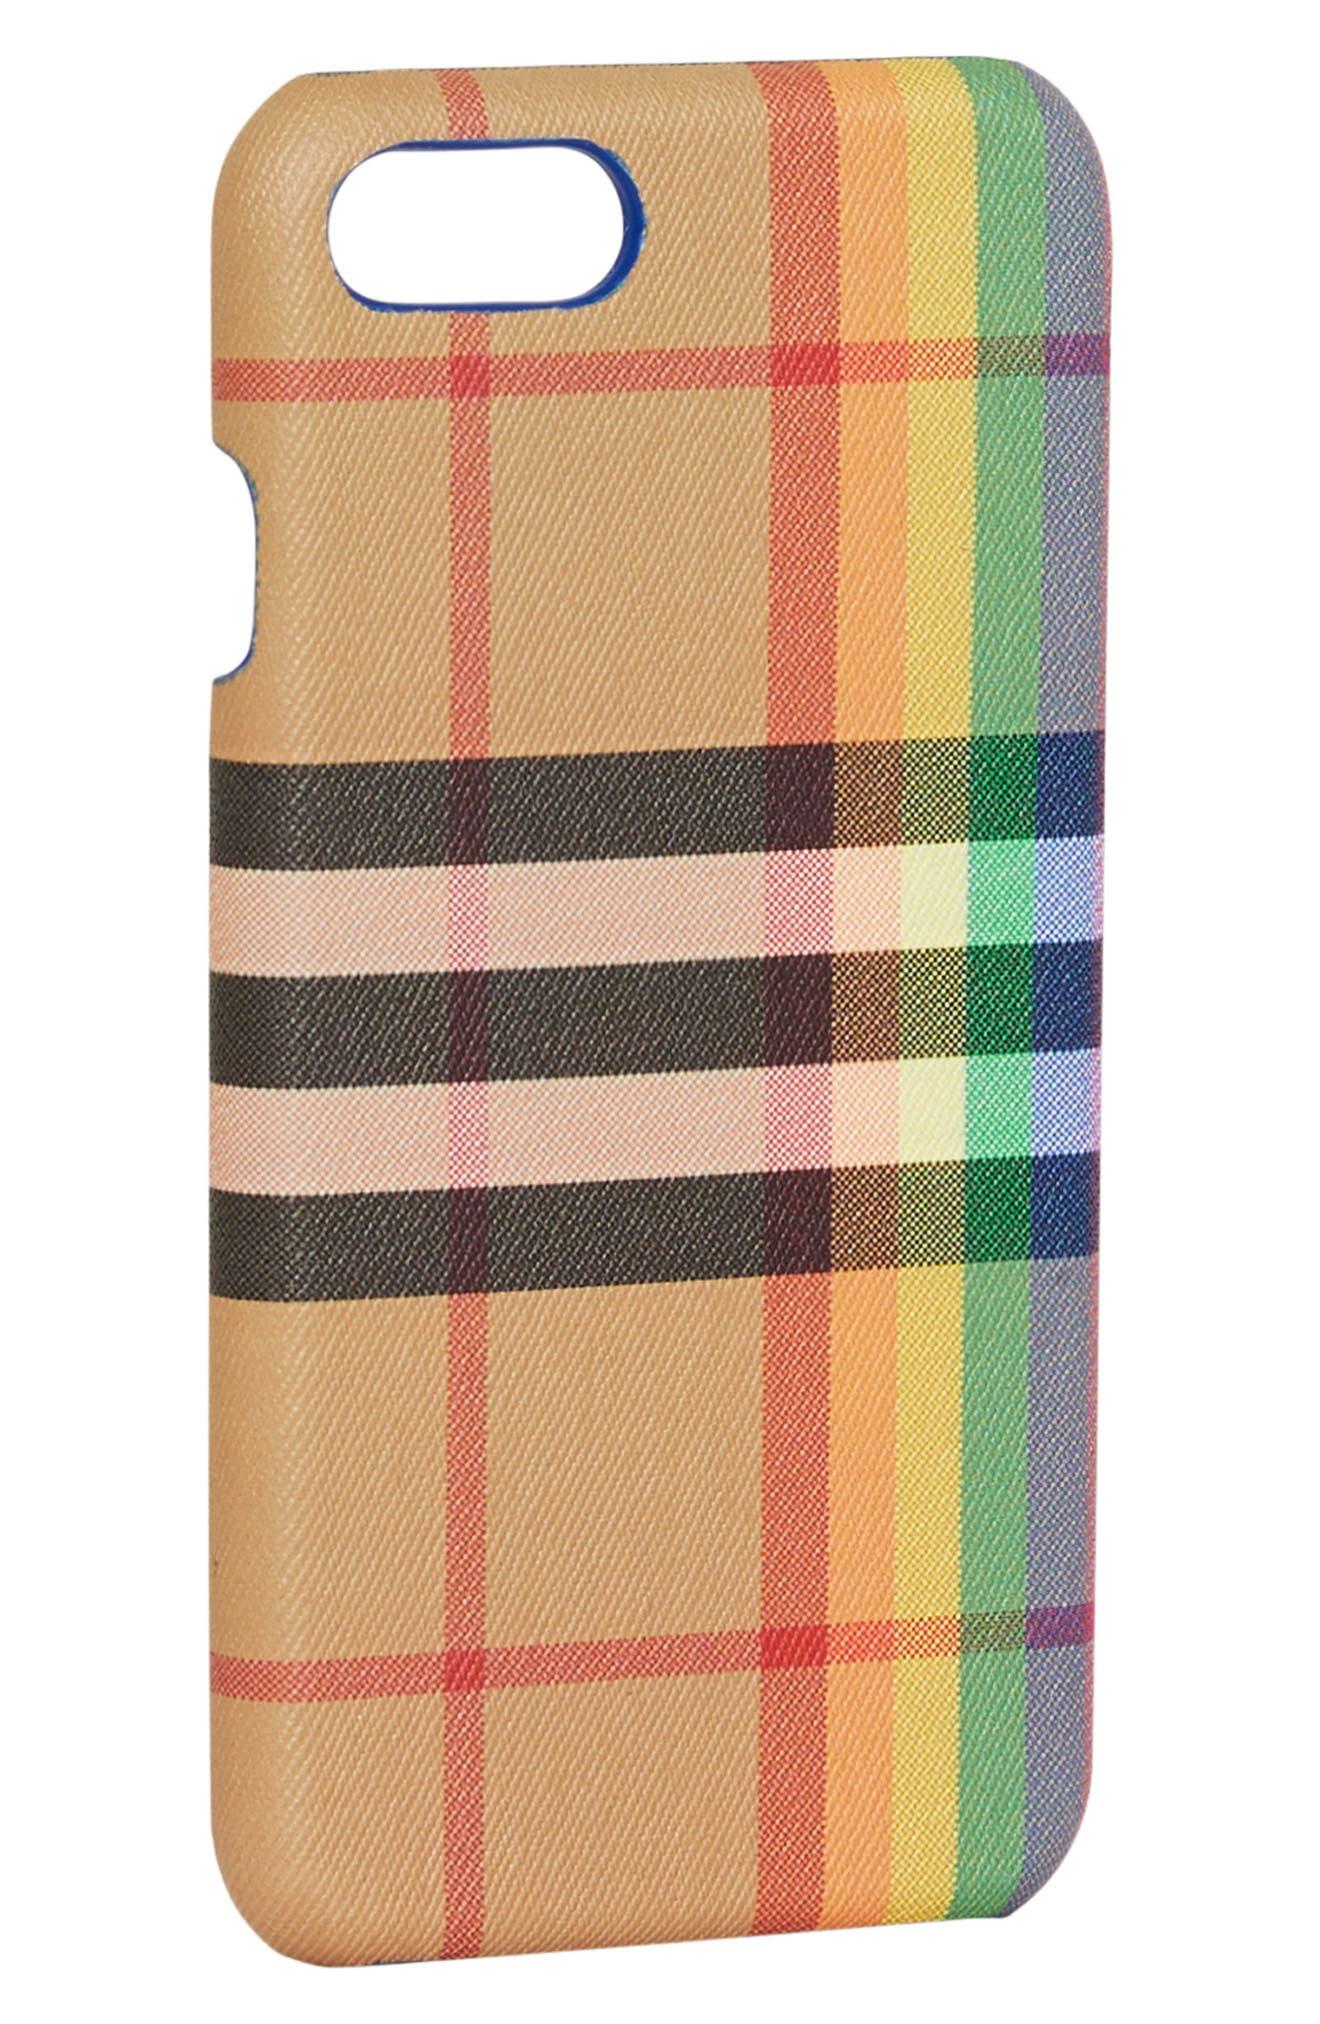 Vintage Check Rainbow iPhone 8 Case,                             Alternate thumbnail 2, color,                             250